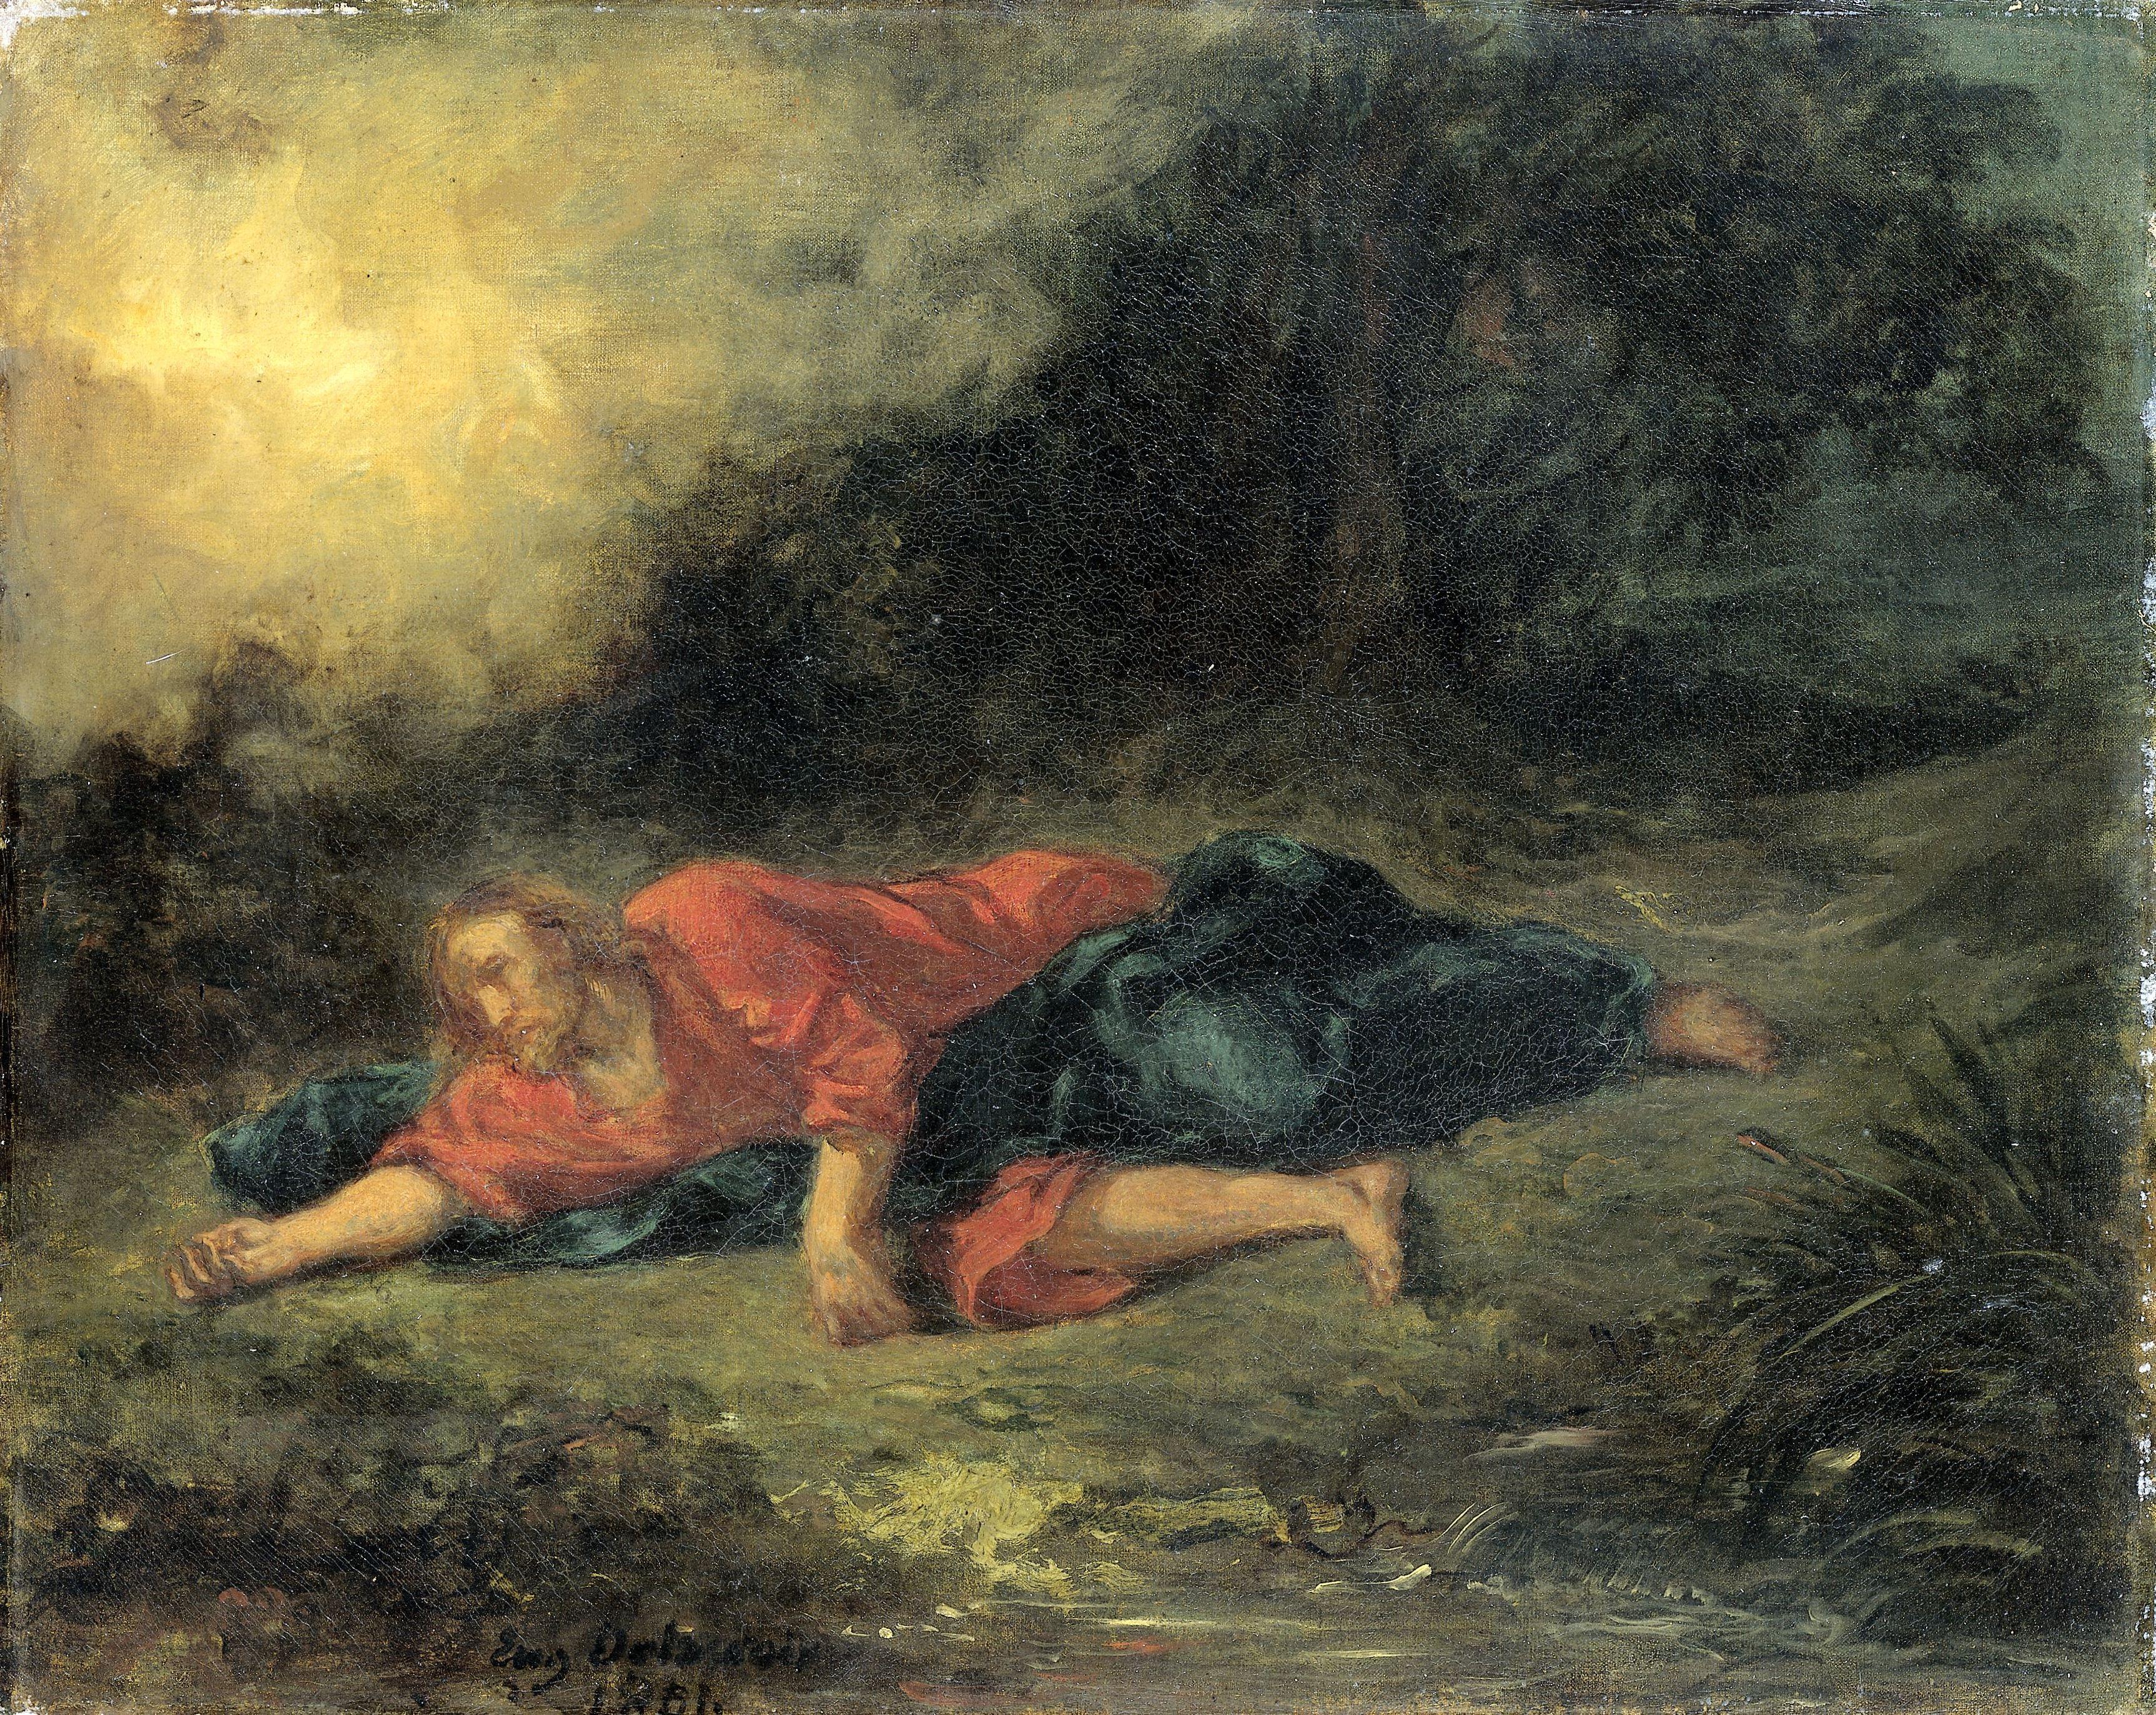 Delacroix Lagonia nel giardino 1851jpg